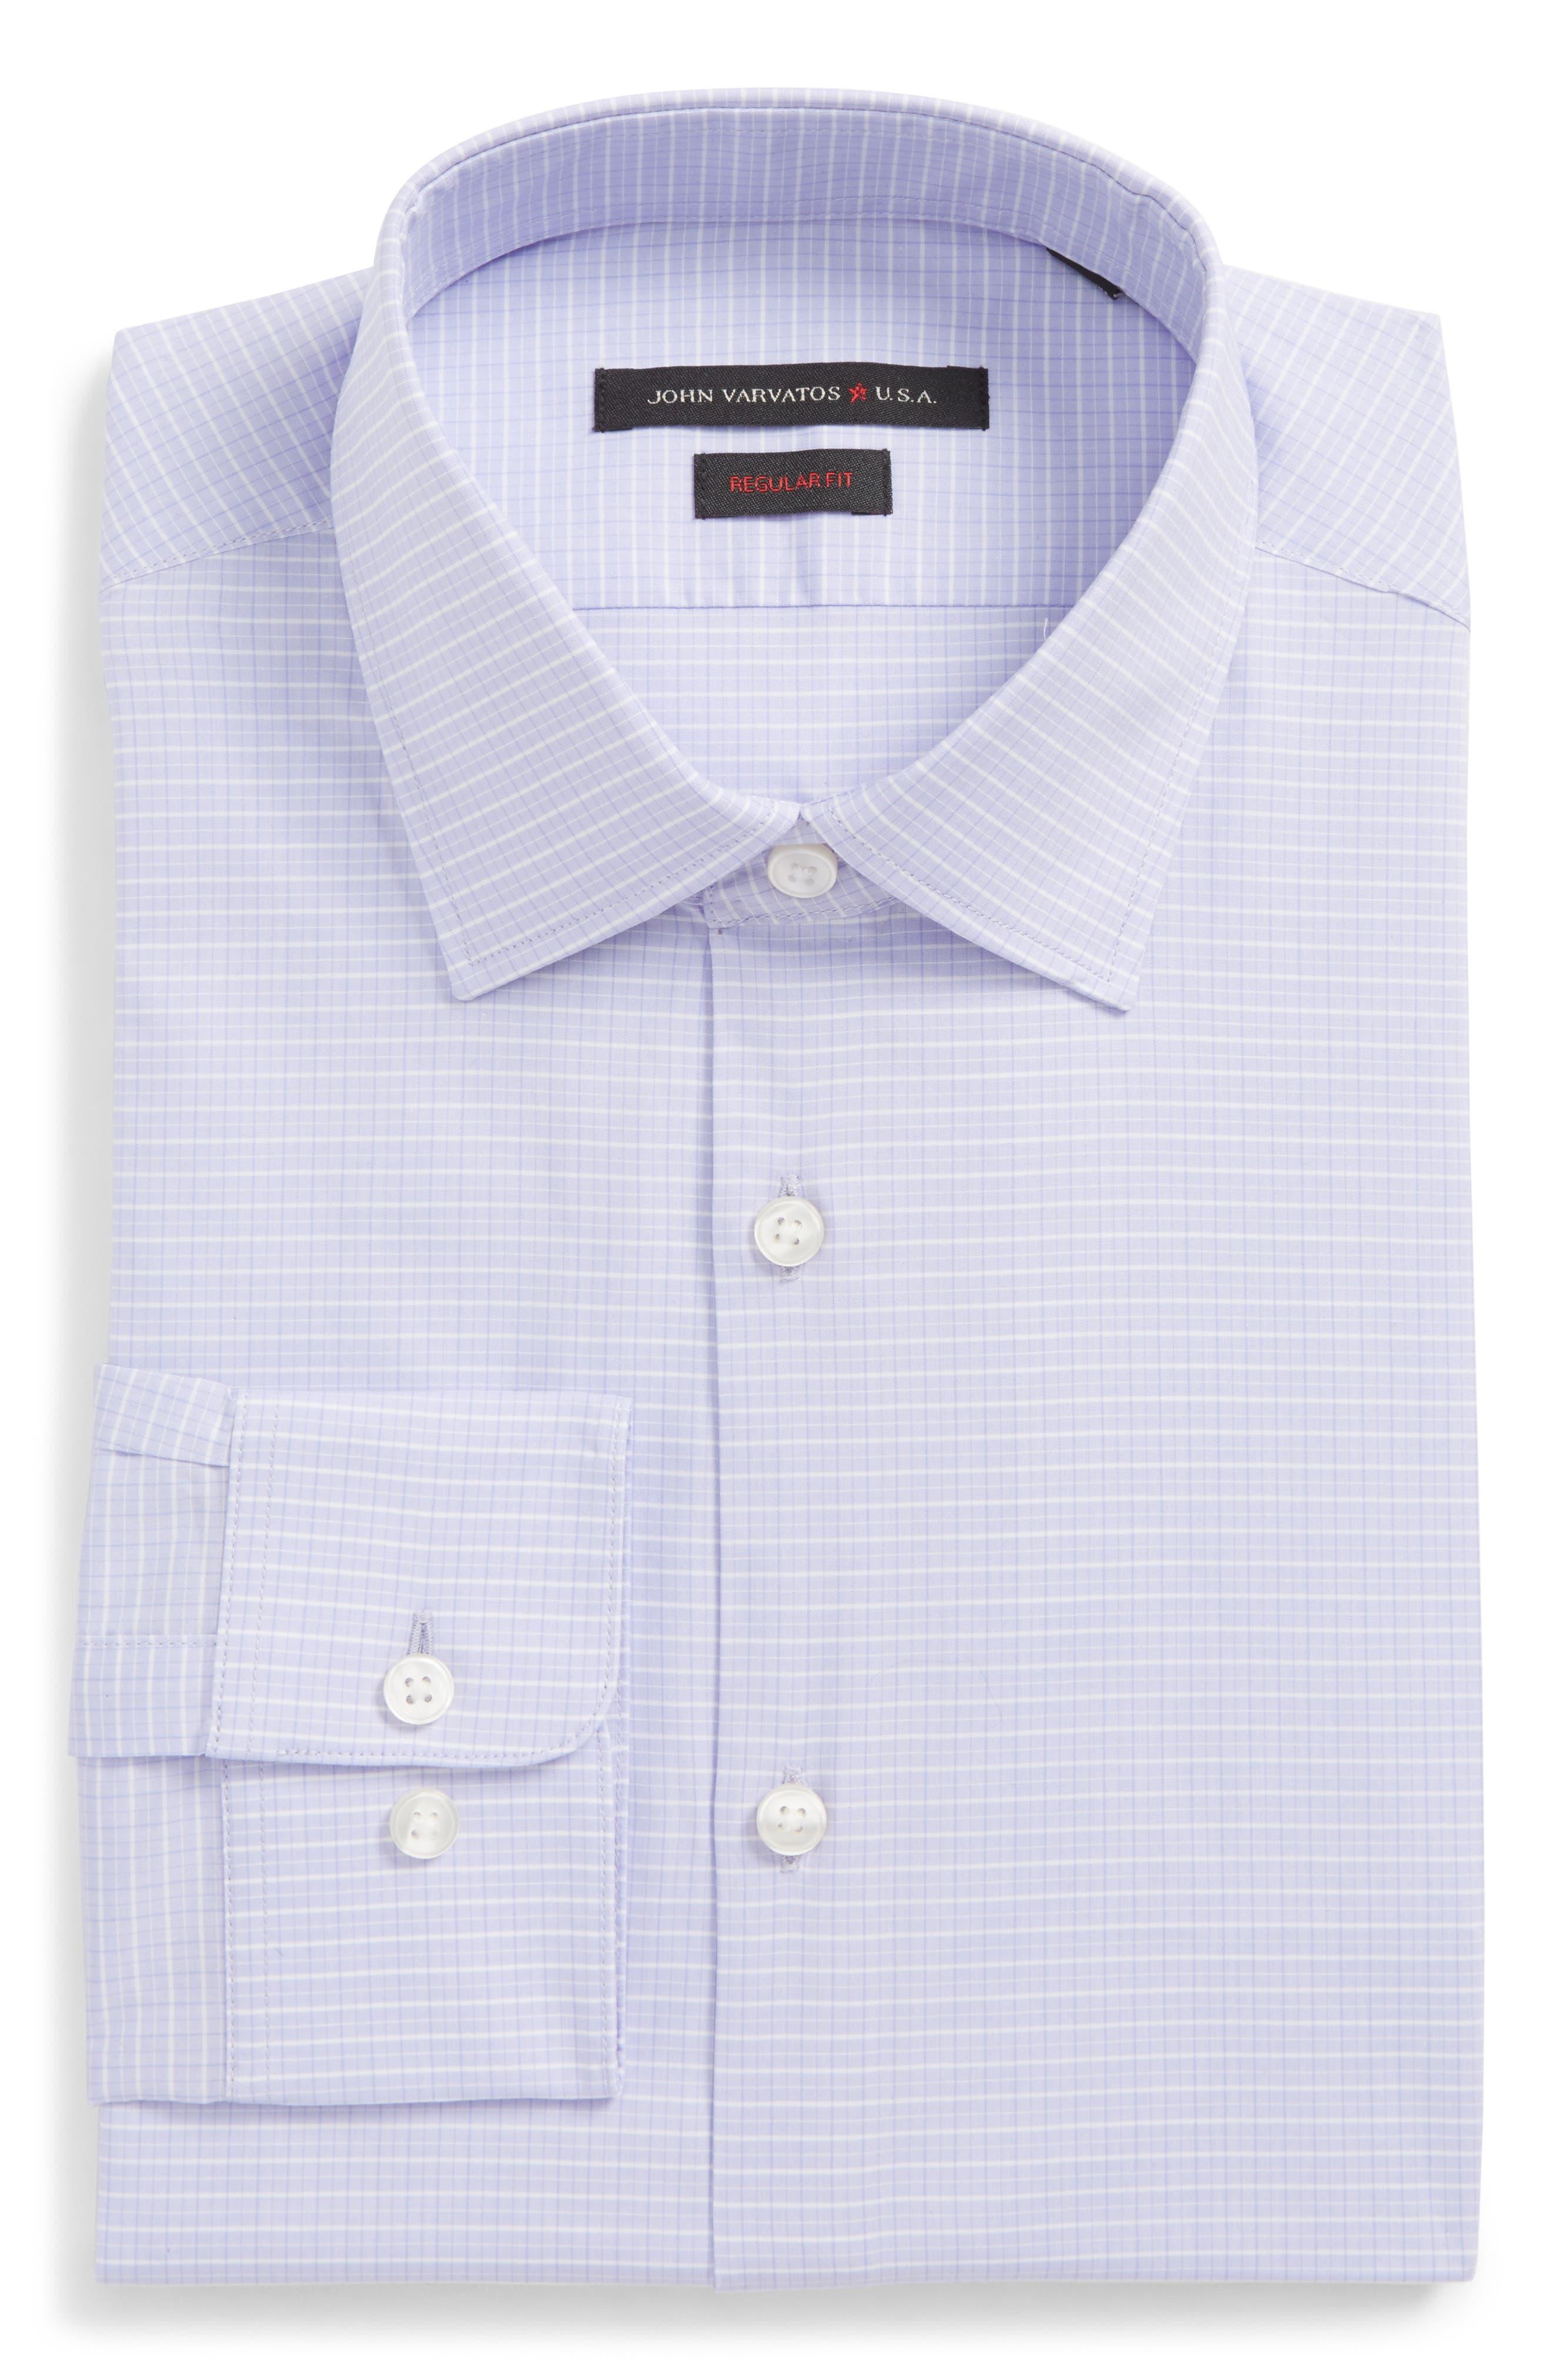 Regular Fit Stretch Check Dress Shirt,                             Main thumbnail 1, color,                             Thistle